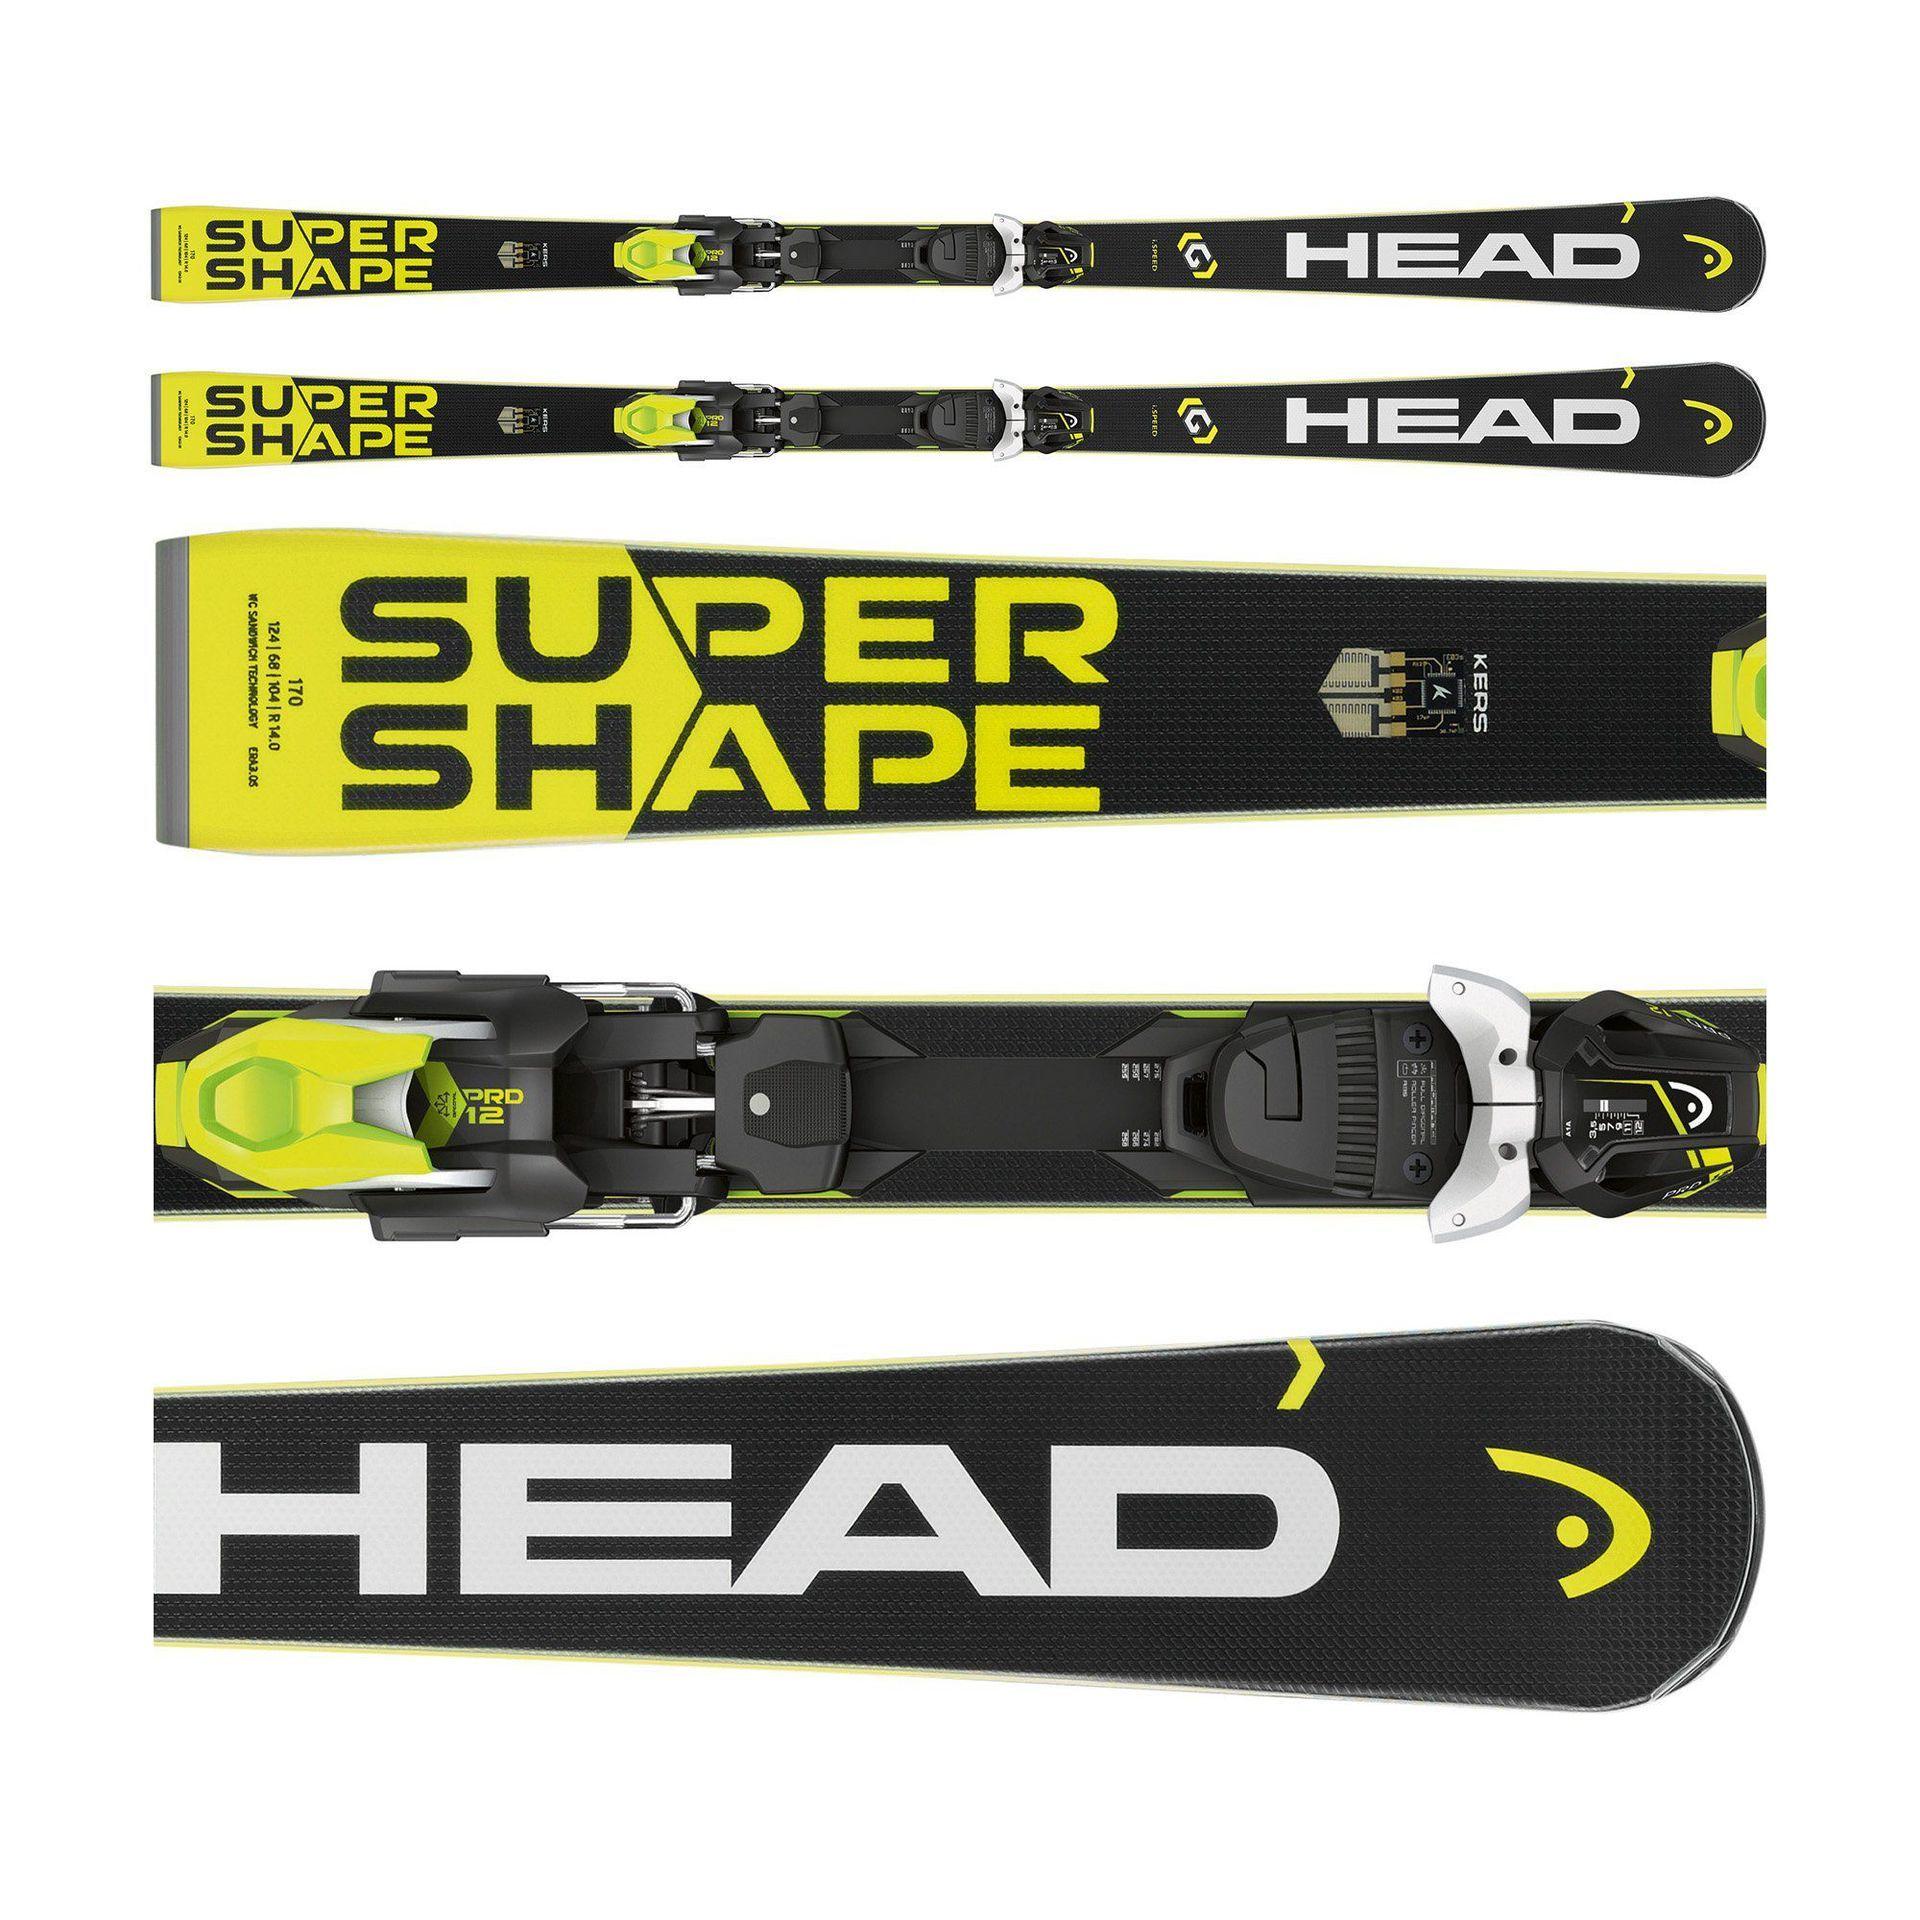 NARTY HEAD SUPERSHAPE ISPEED 310327 1